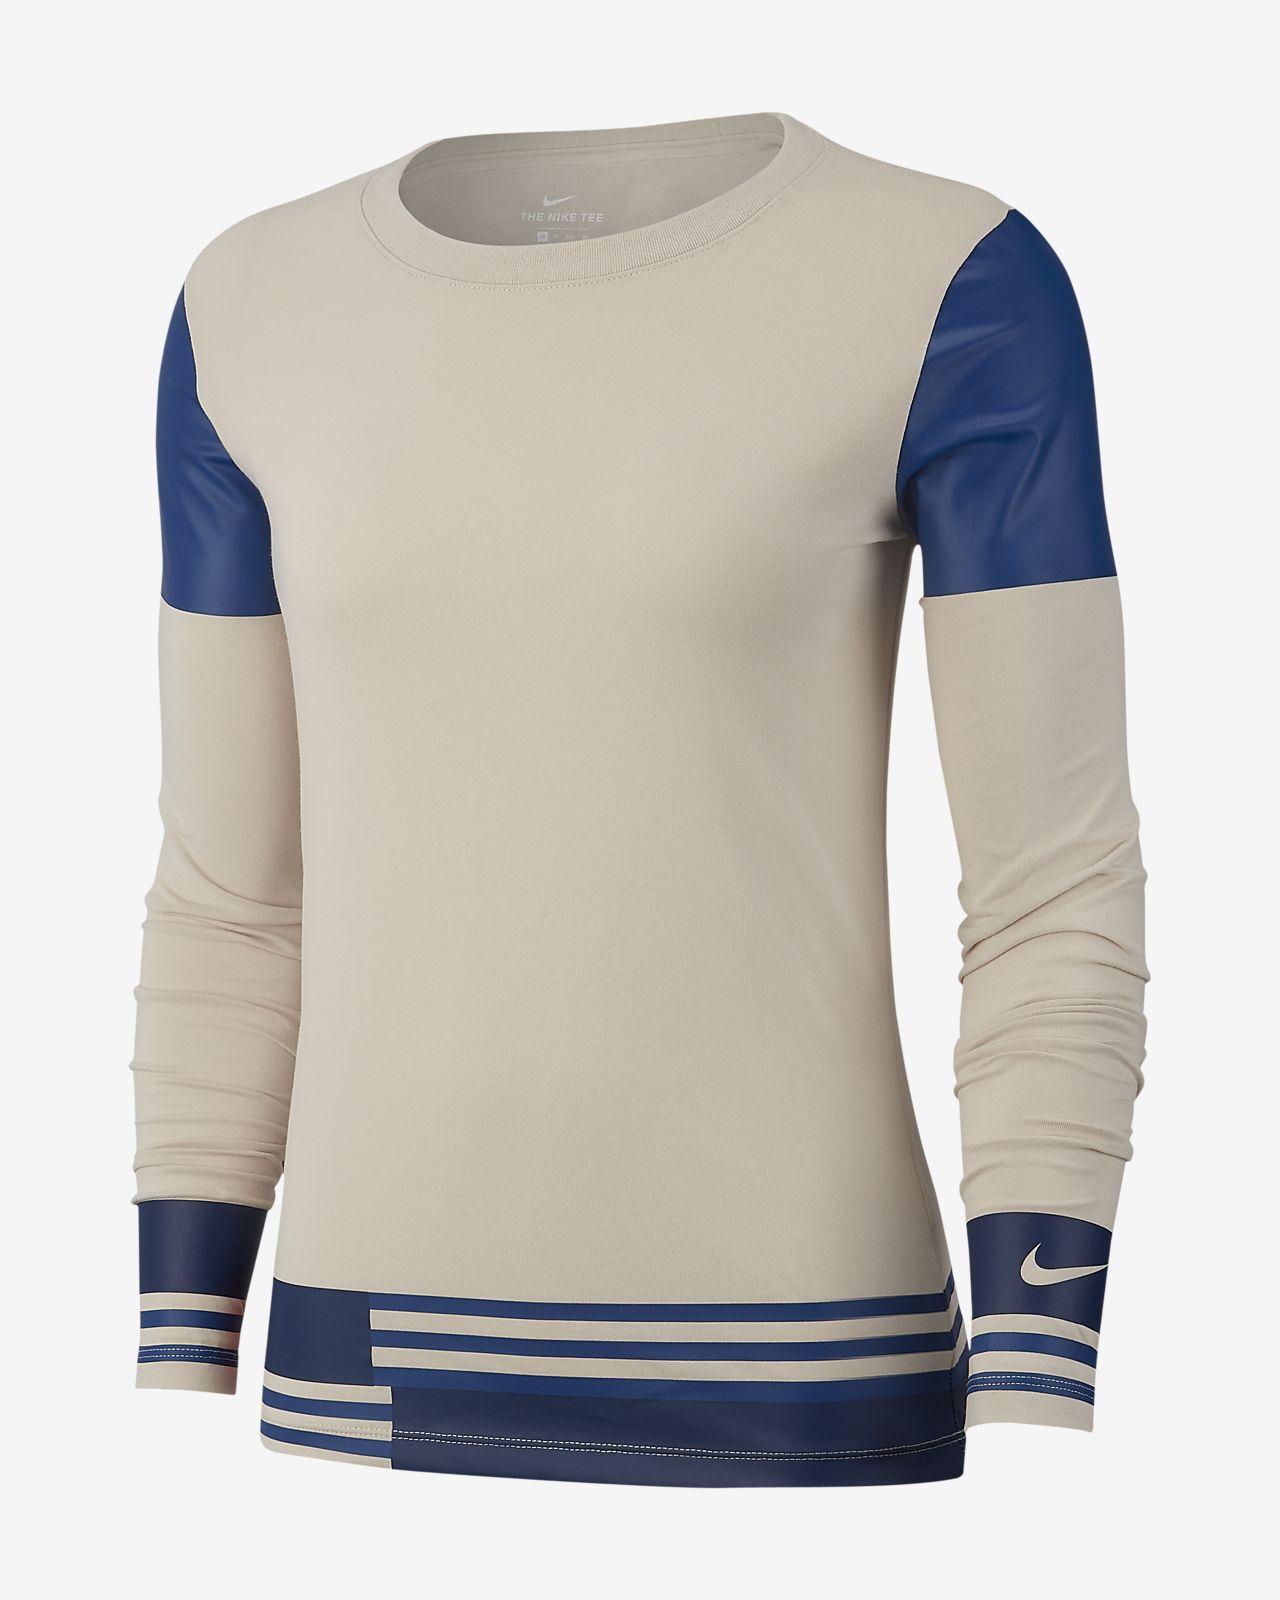 Running À Pour Manches De Tee Nike Dri Fit Femme Shirt Longues tSwpSEUq